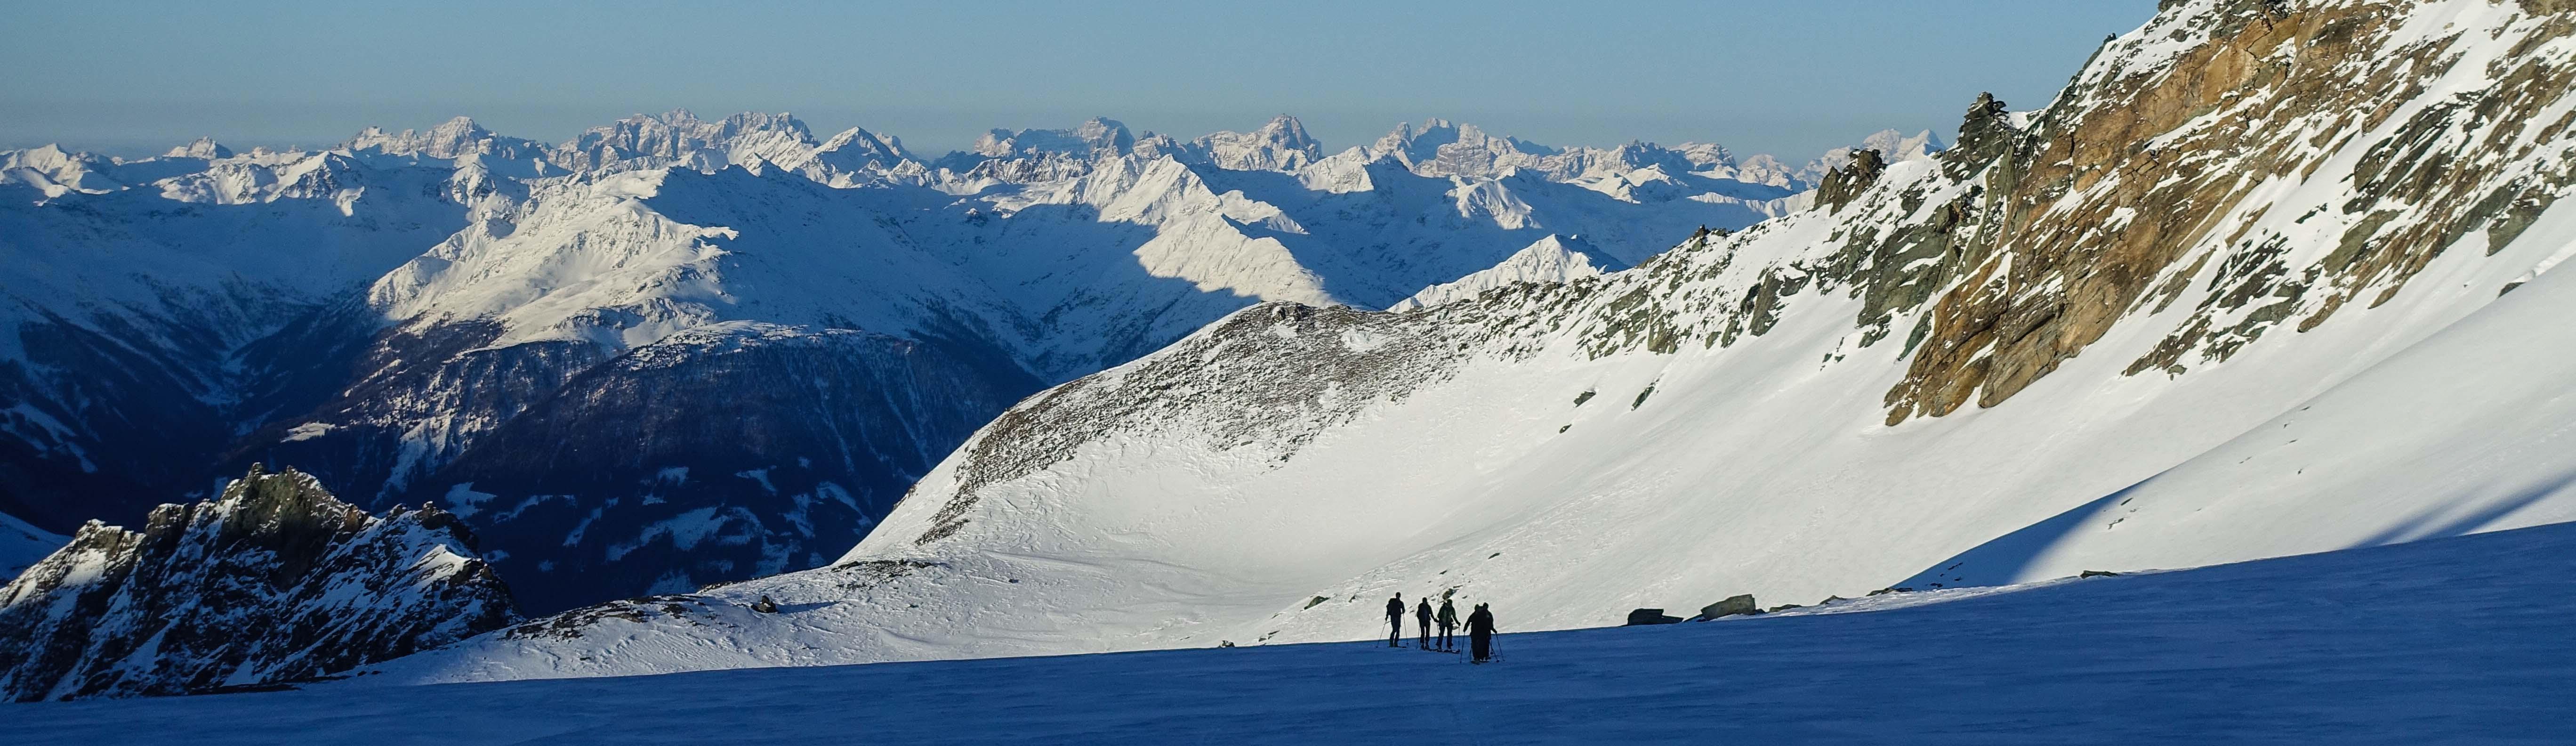 Großglockner Bergführer, Skitour Großglockner, Österreich Skitour